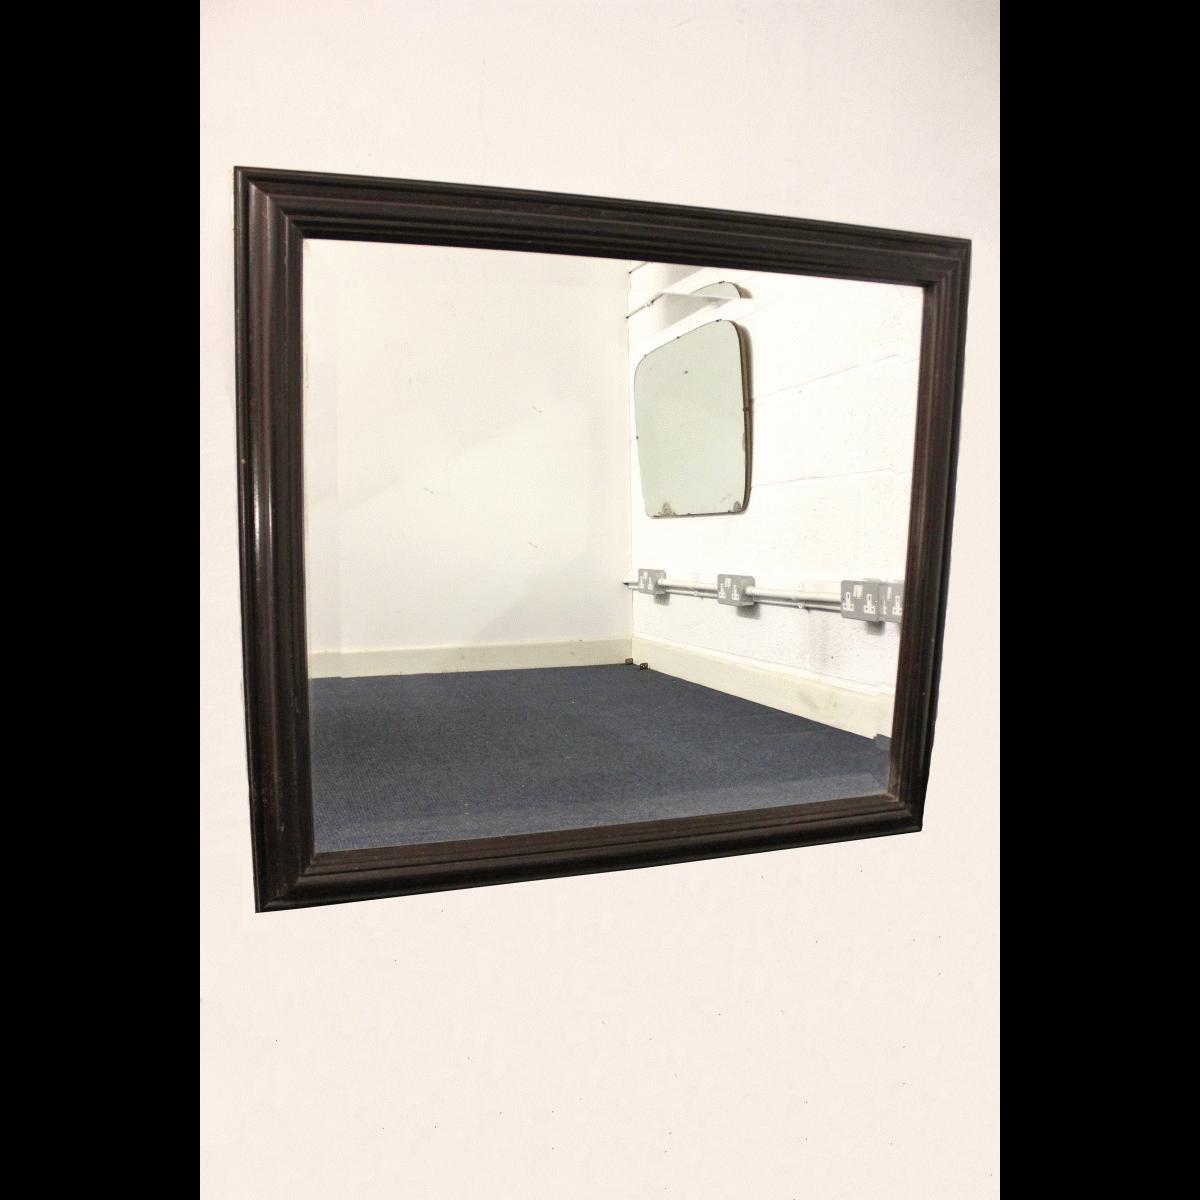 0070007 dark wooden framed mirror x1 91cm wide by 83cm for Long framed mirror